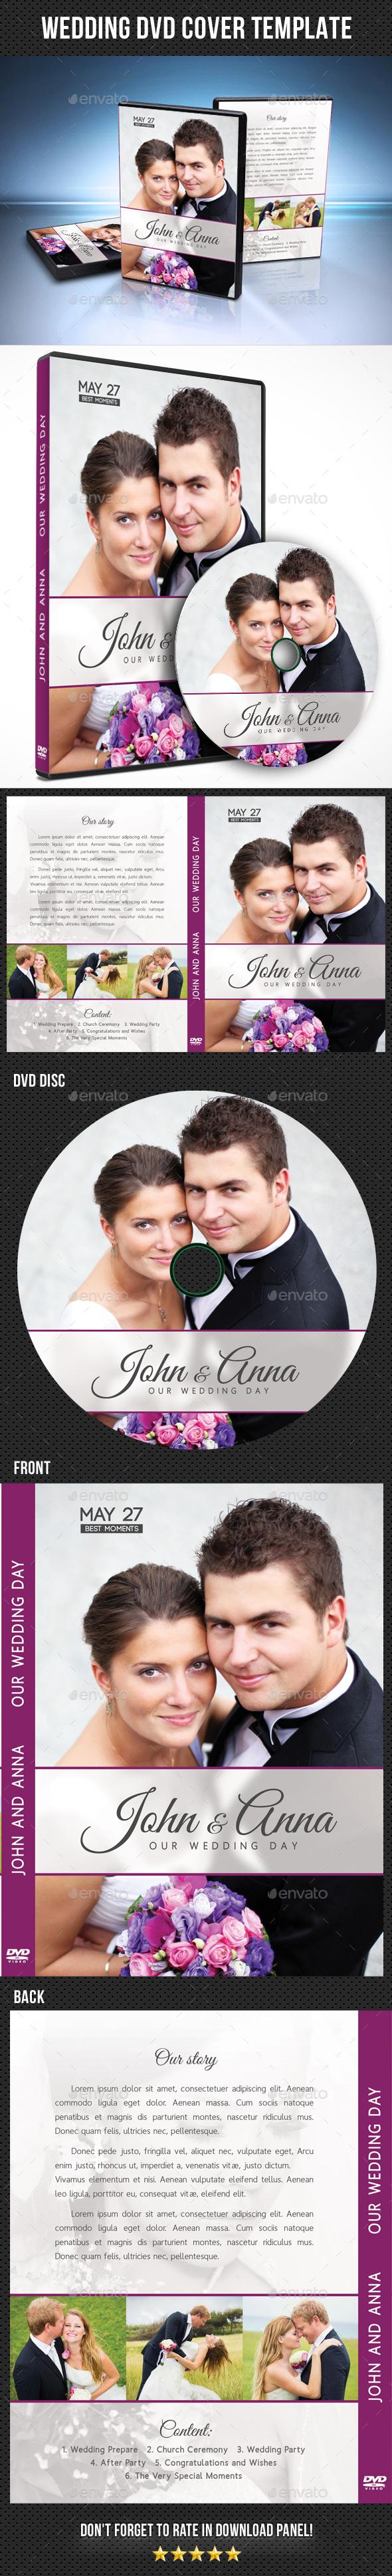 Wedding DVD Cover Template 20 - CD & DVD Artwork Print Templates